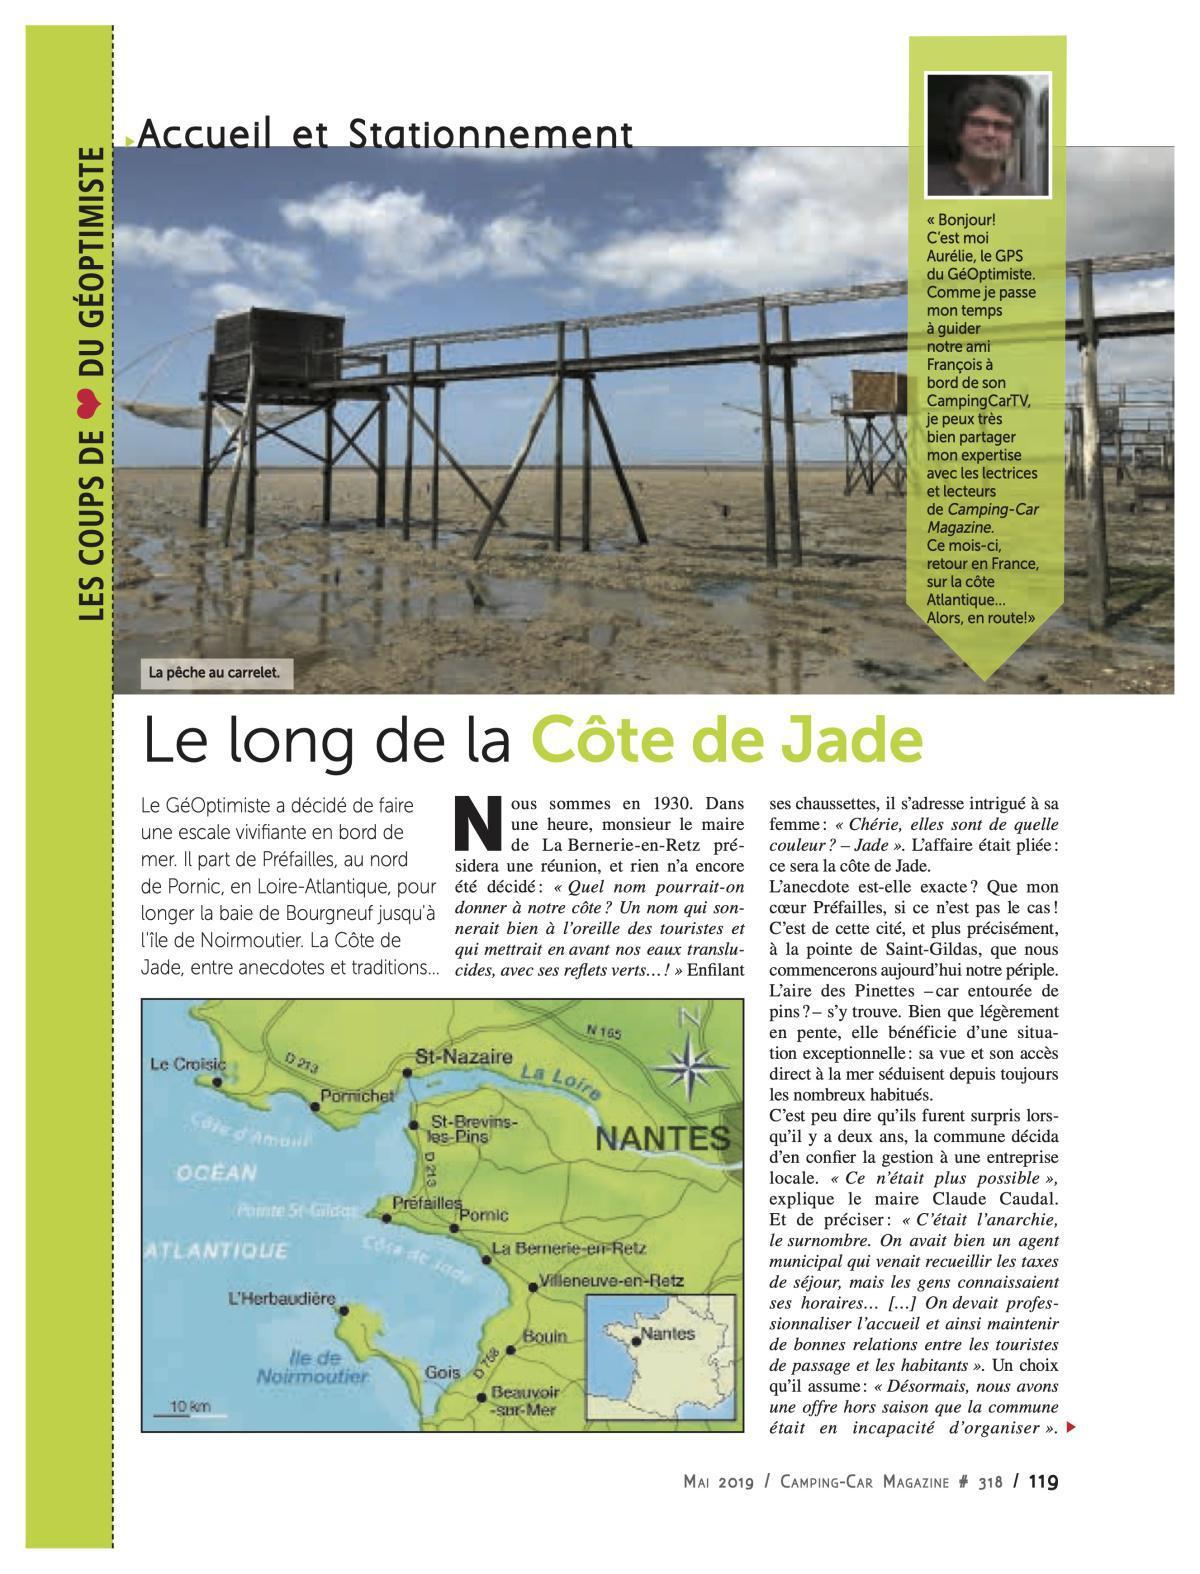 La Côte de Jade - CCM 318